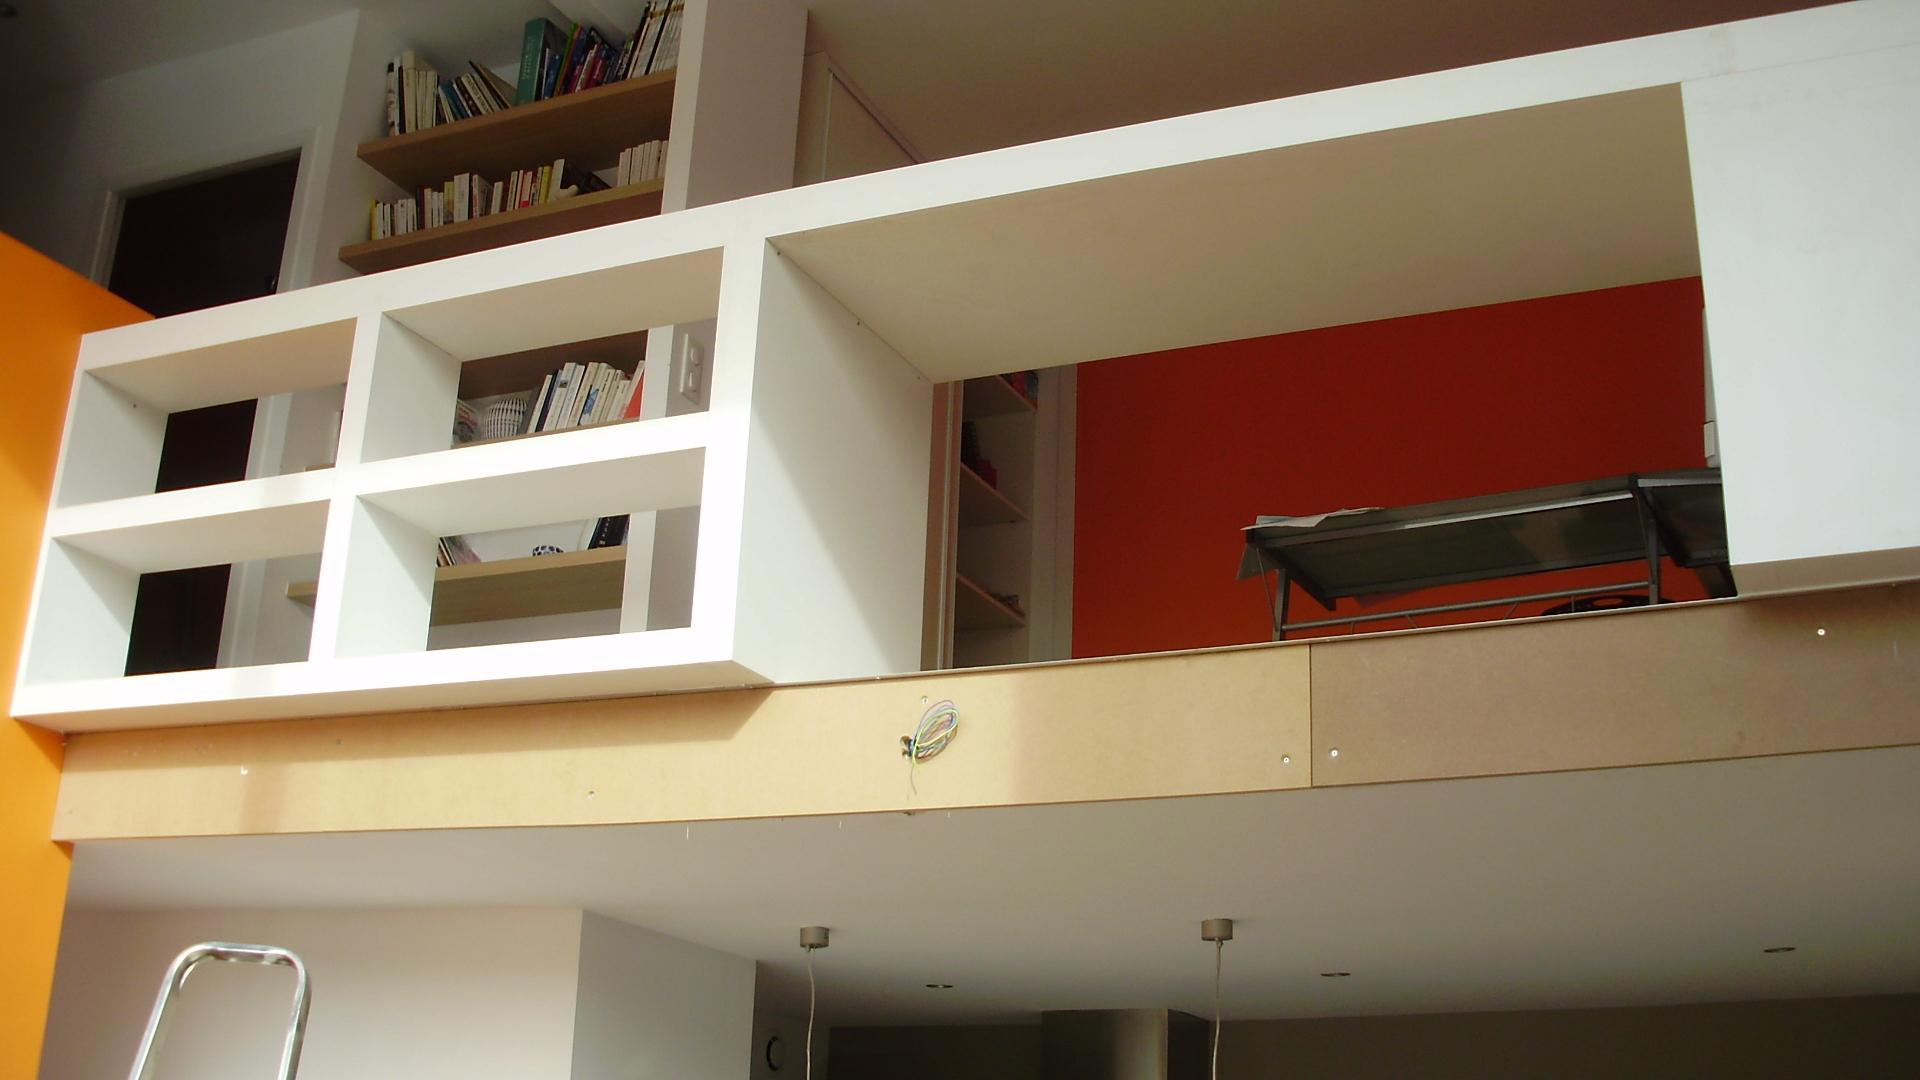 bureau garde corps julien ravanne julien ravanne. Black Bedroom Furniture Sets. Home Design Ideas